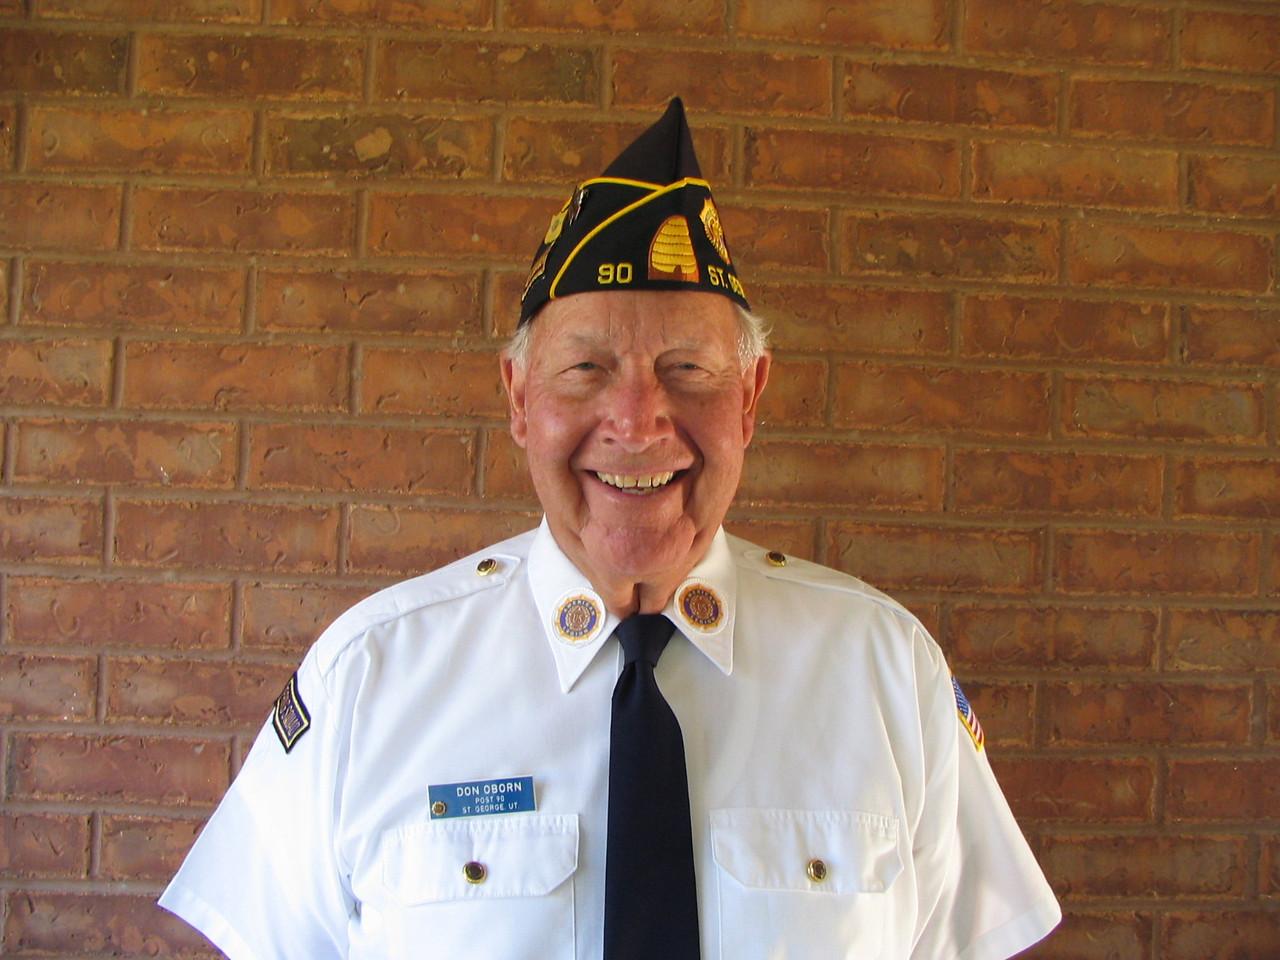 Don Oborn, Commander Post 90,   06